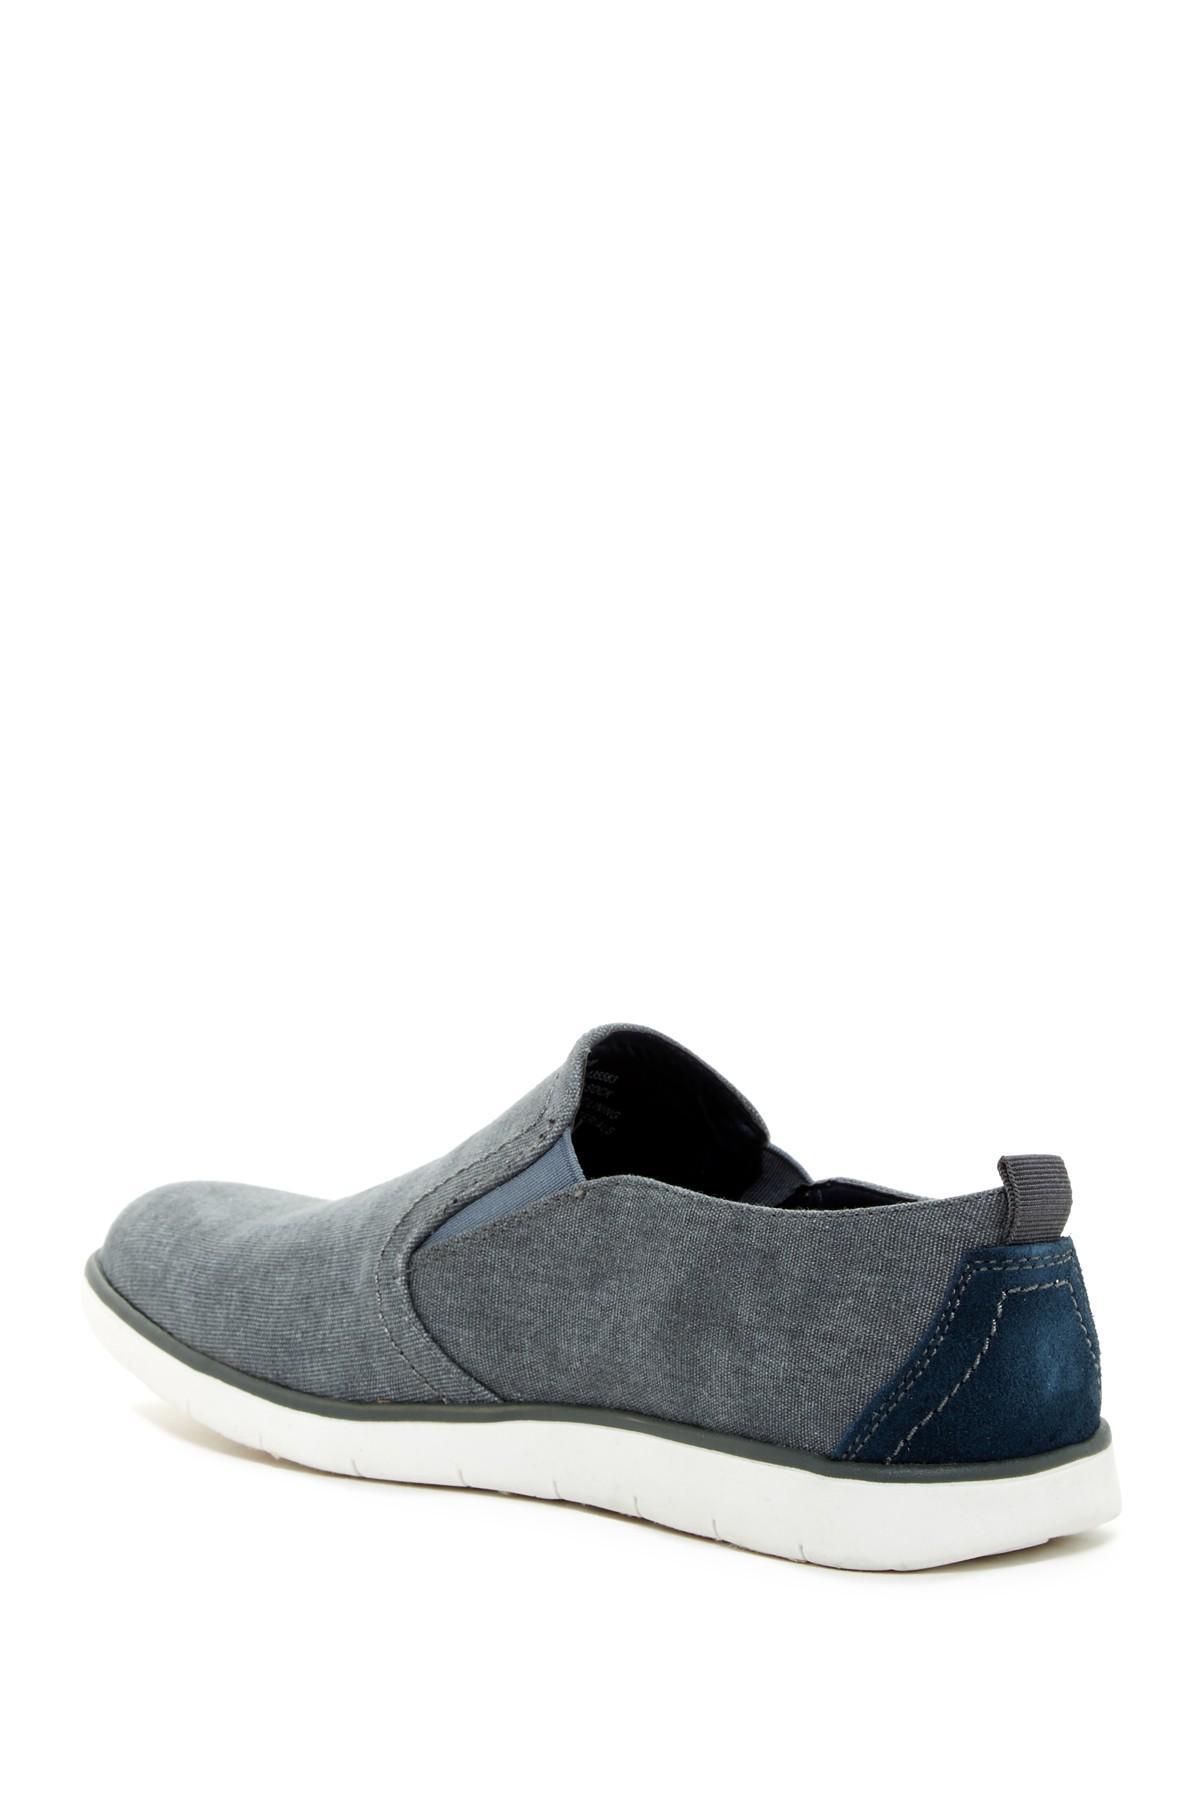 Filippa K Men S Shoes